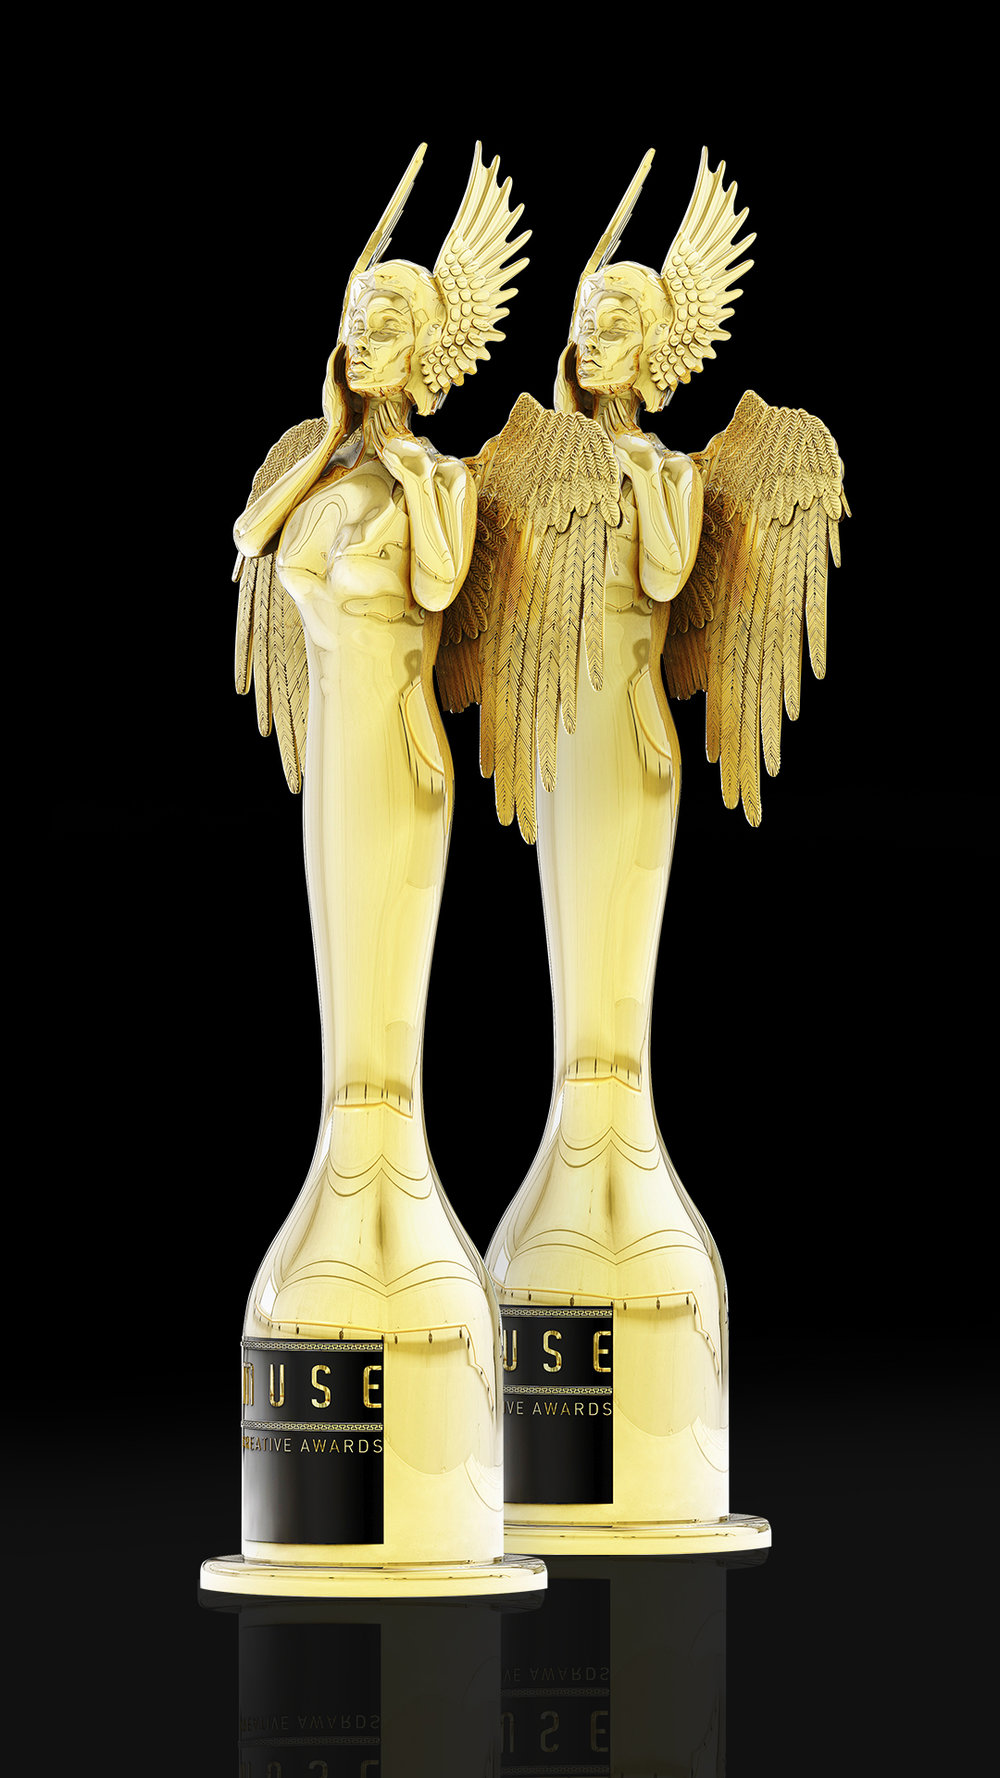 Muse Creative Awards Logo - Gold.png